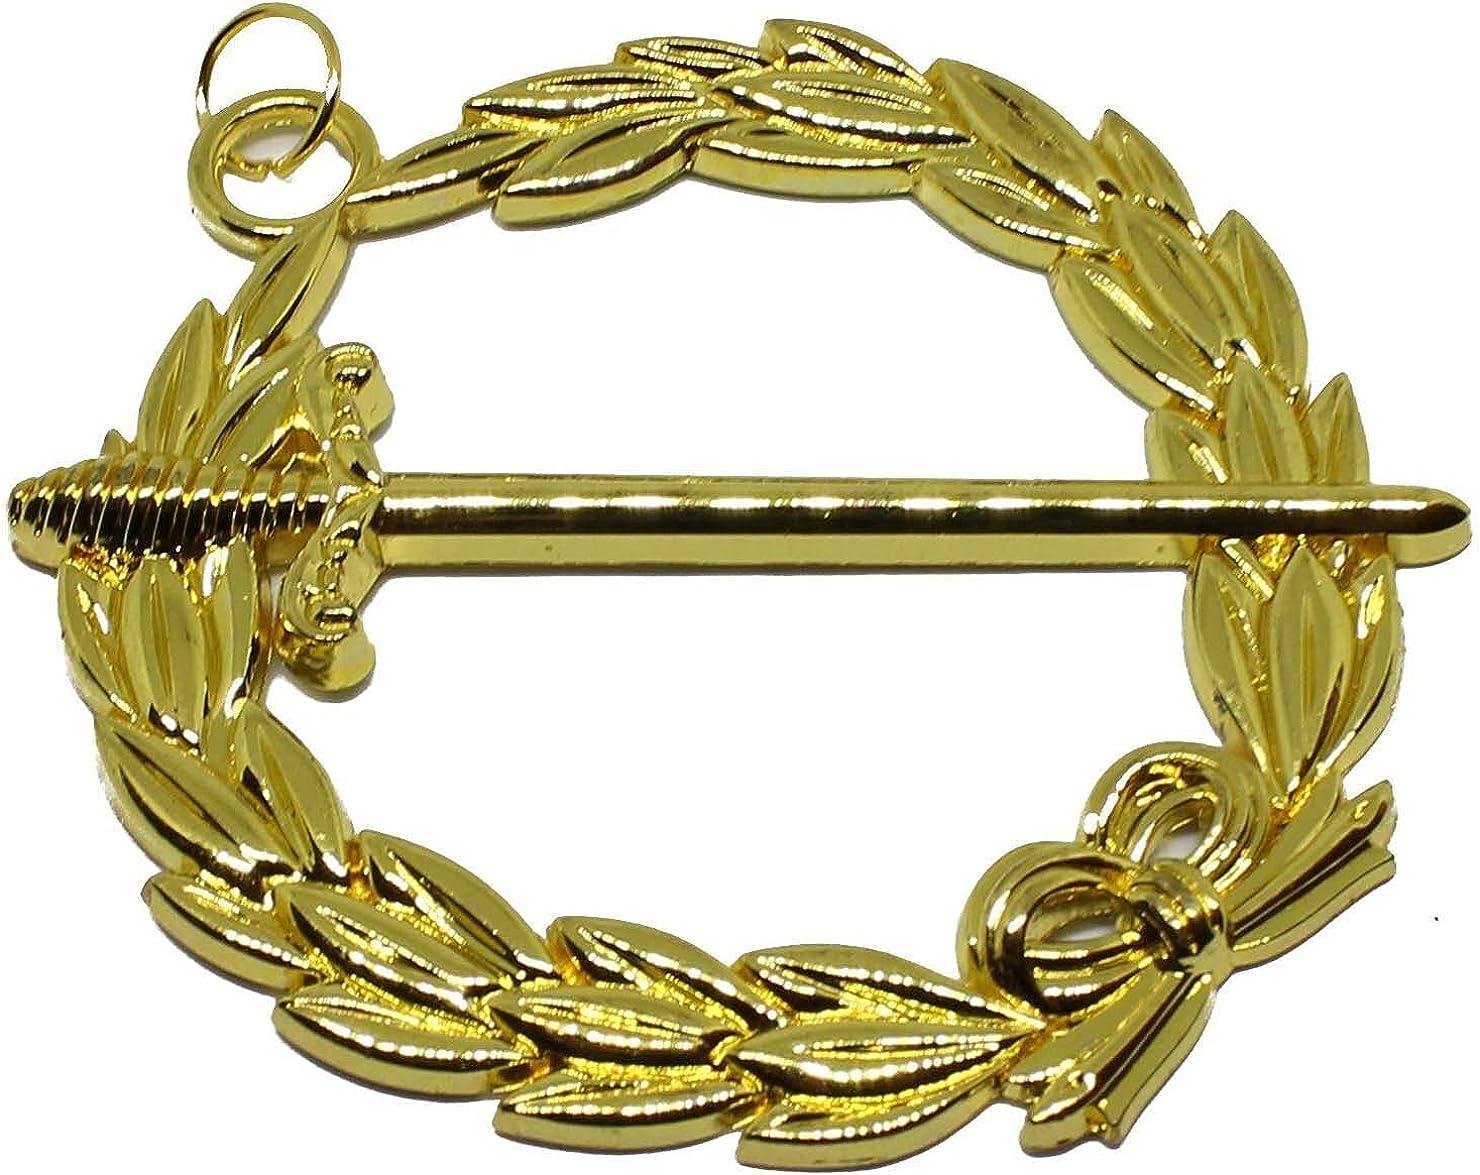 Masonic Sword Collar Grand Lodge Jewel - Tyler/Tiler/Outer Guard